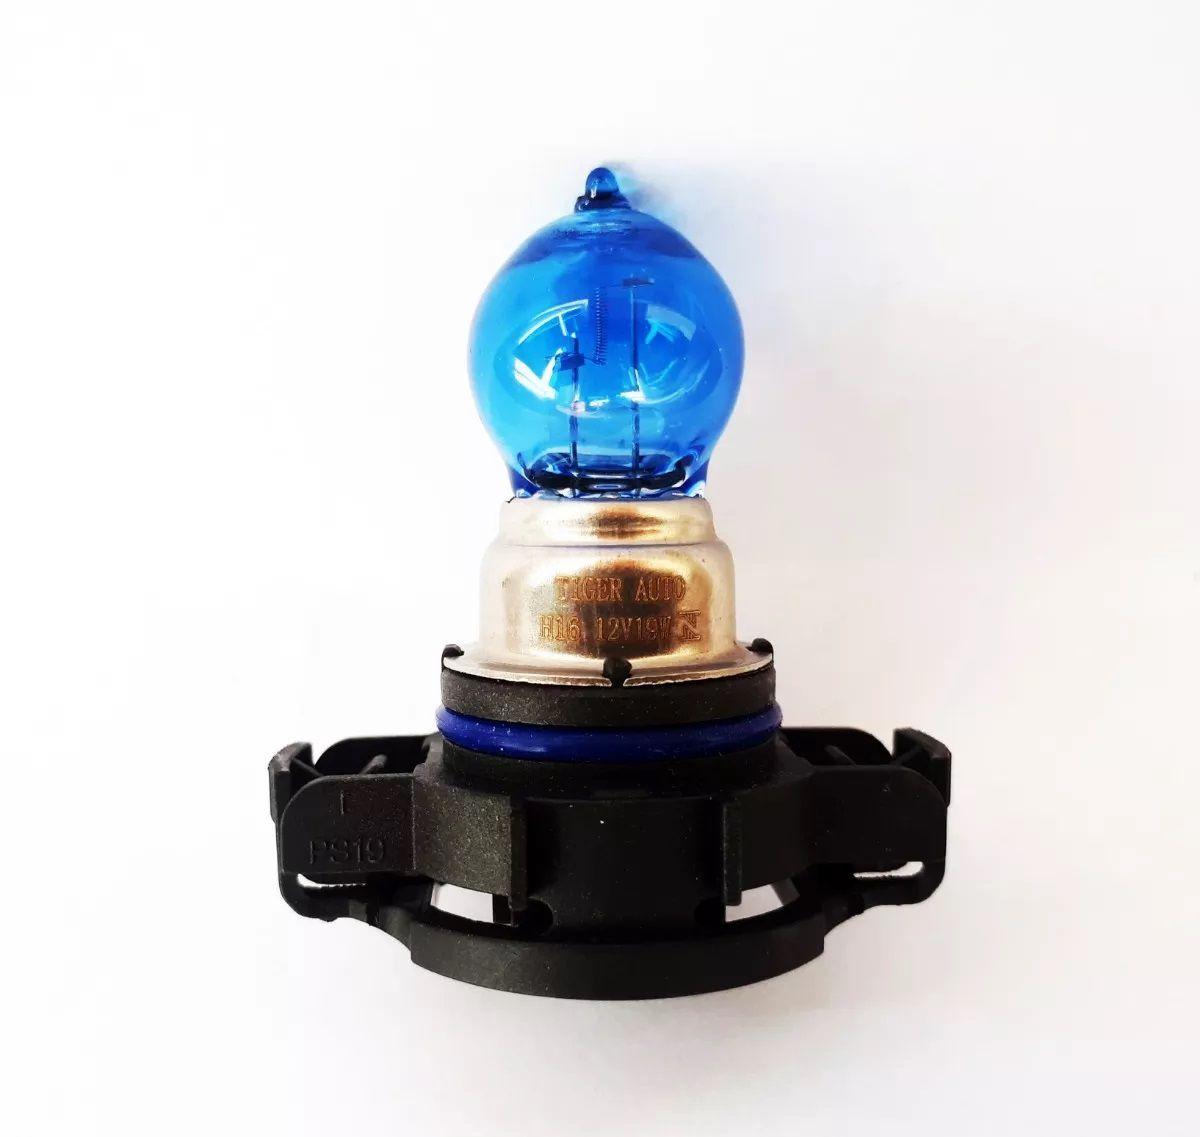 Par Lâmpada Super Branca H16 19w PSX 24W 12v Efeito Xenon Premium Inmetro